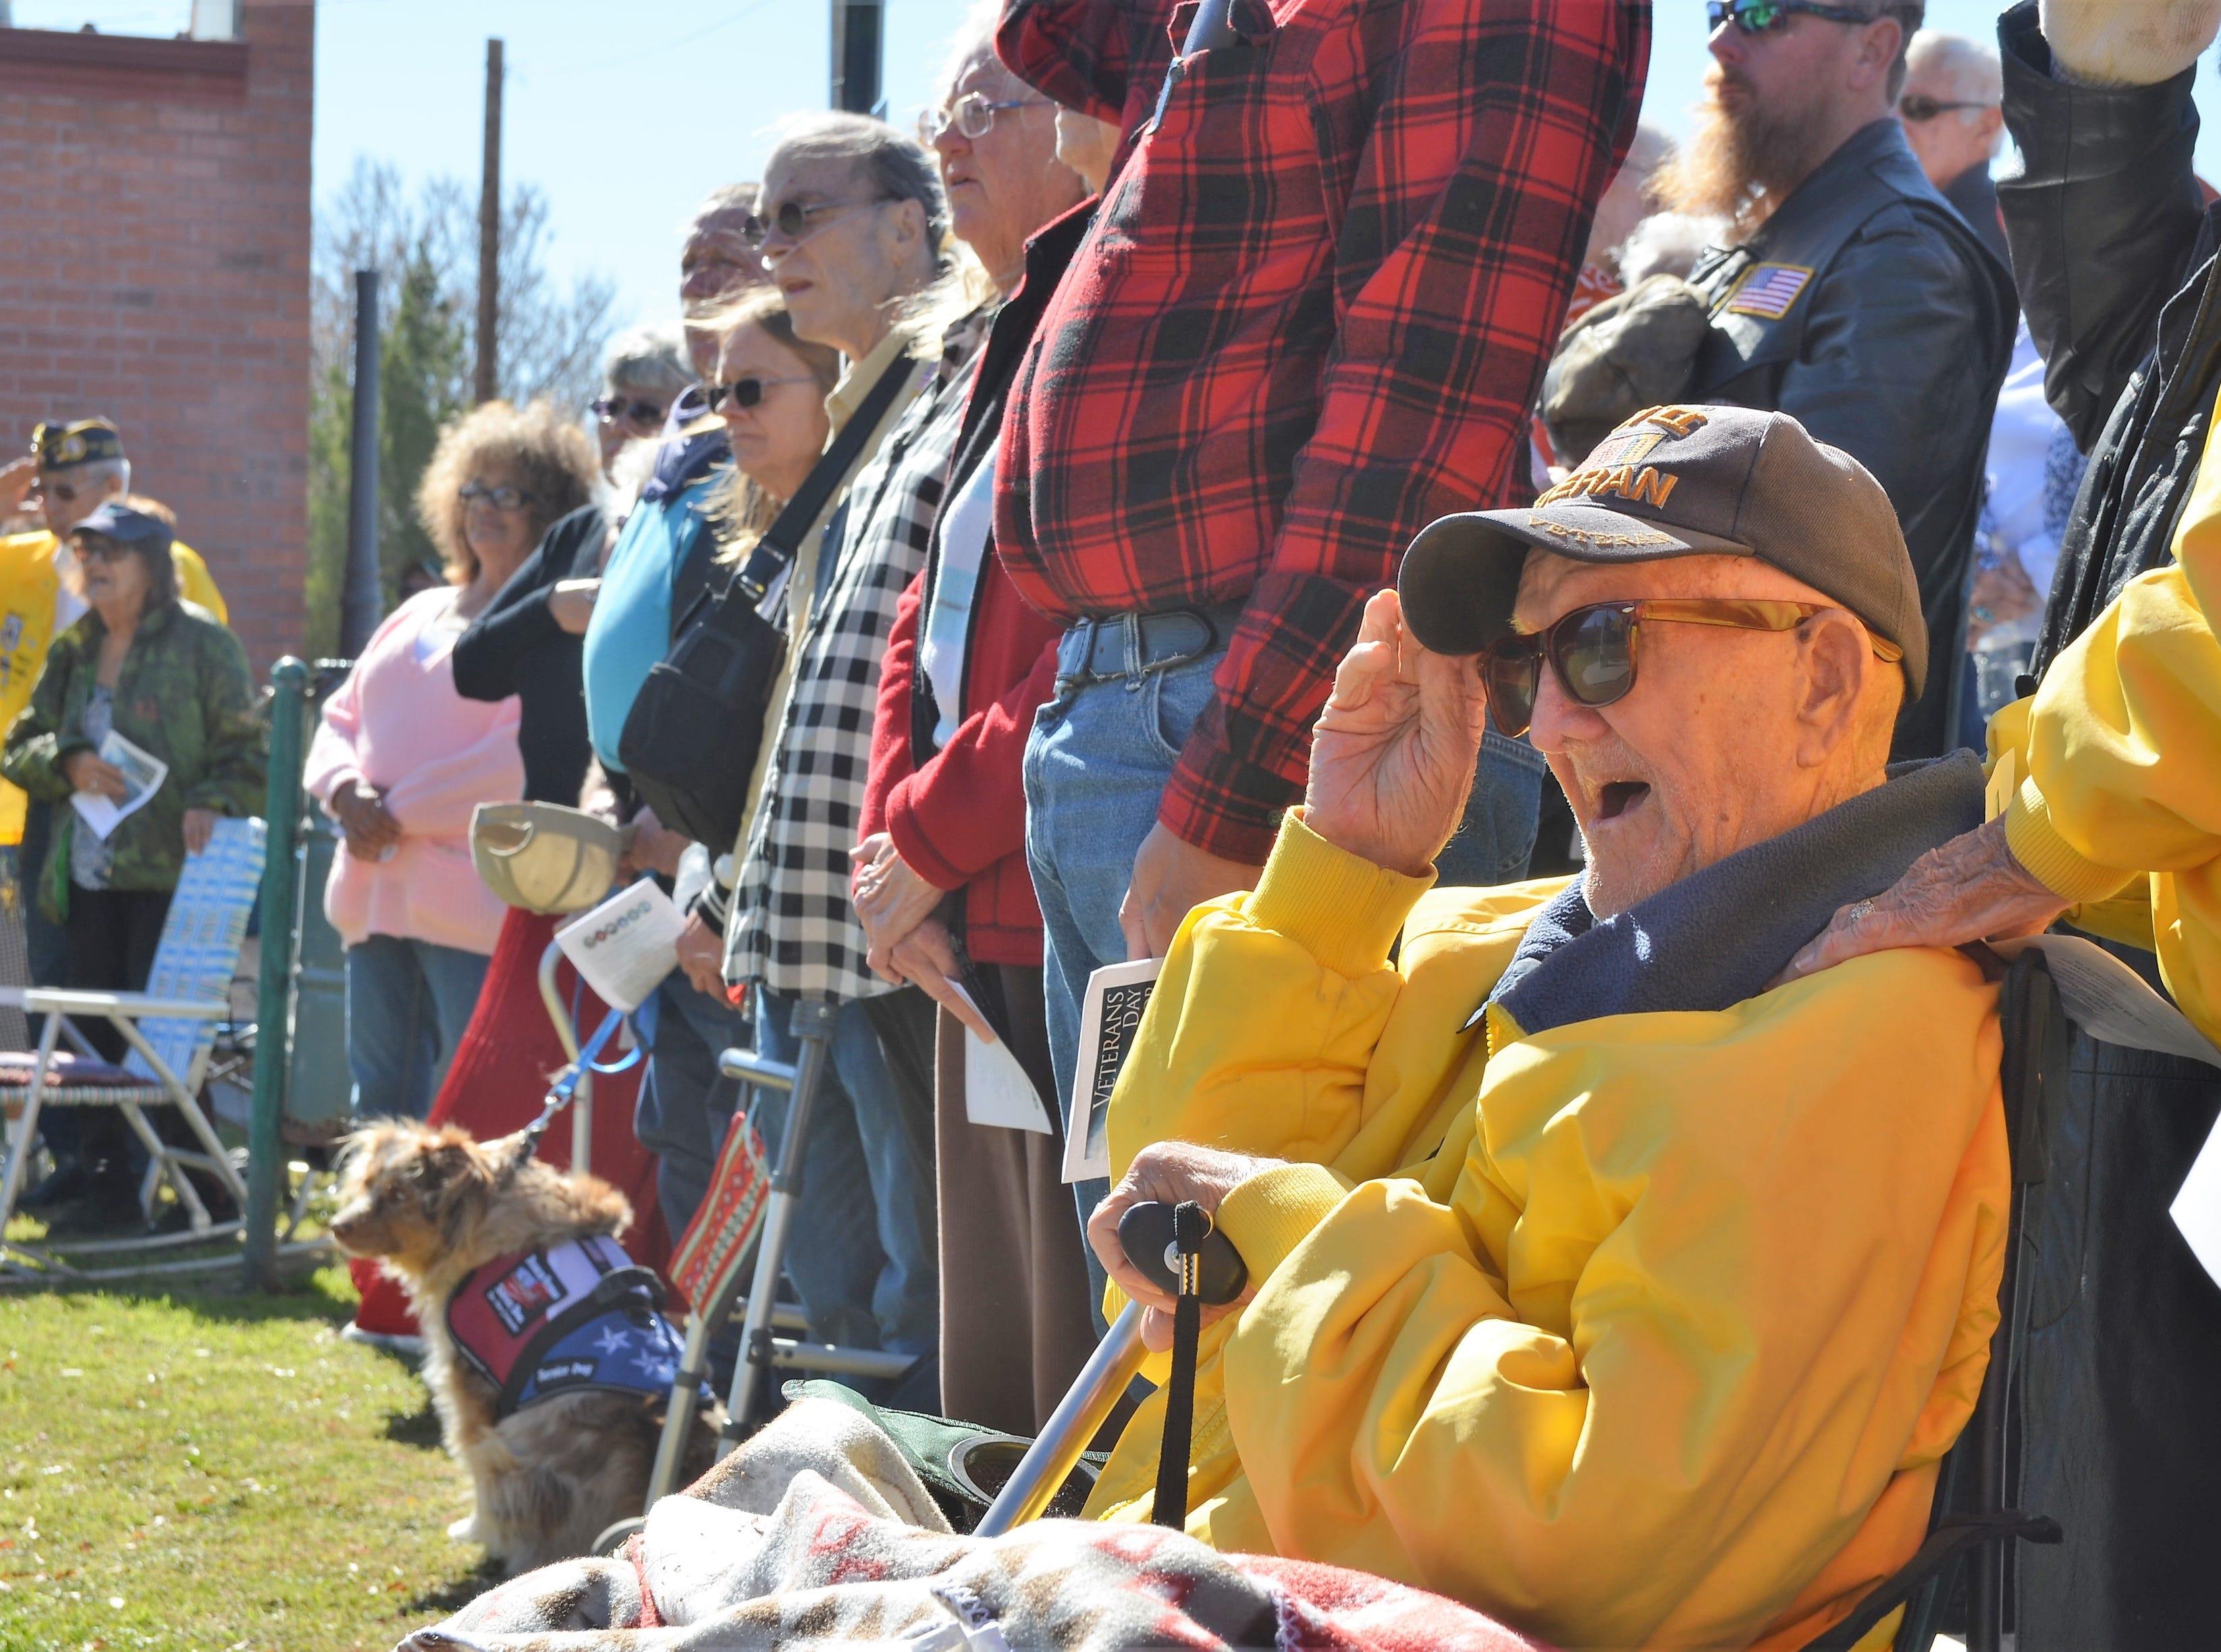 Irving Rutto, 91, a World War II Navy veteran salutes the flags.